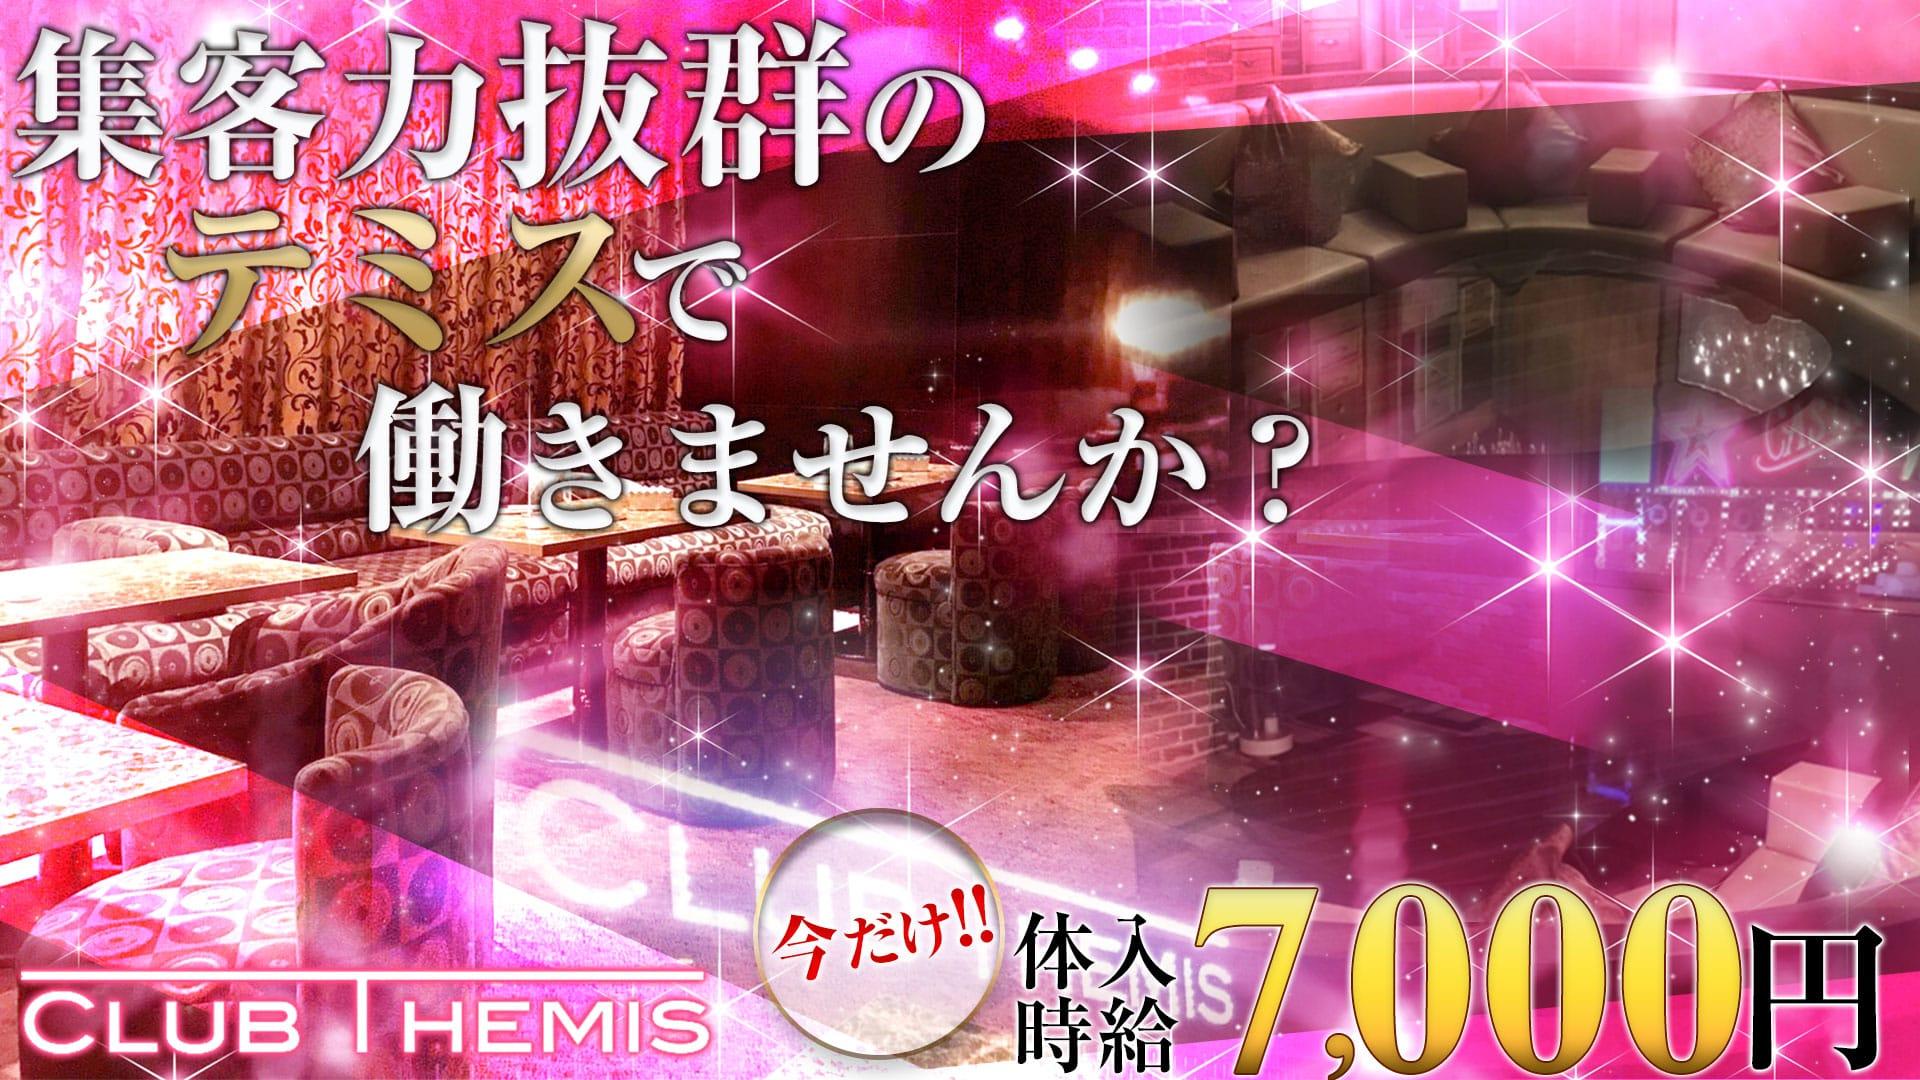 Club Themis(テミス) 松戸キャバクラ TOP画像